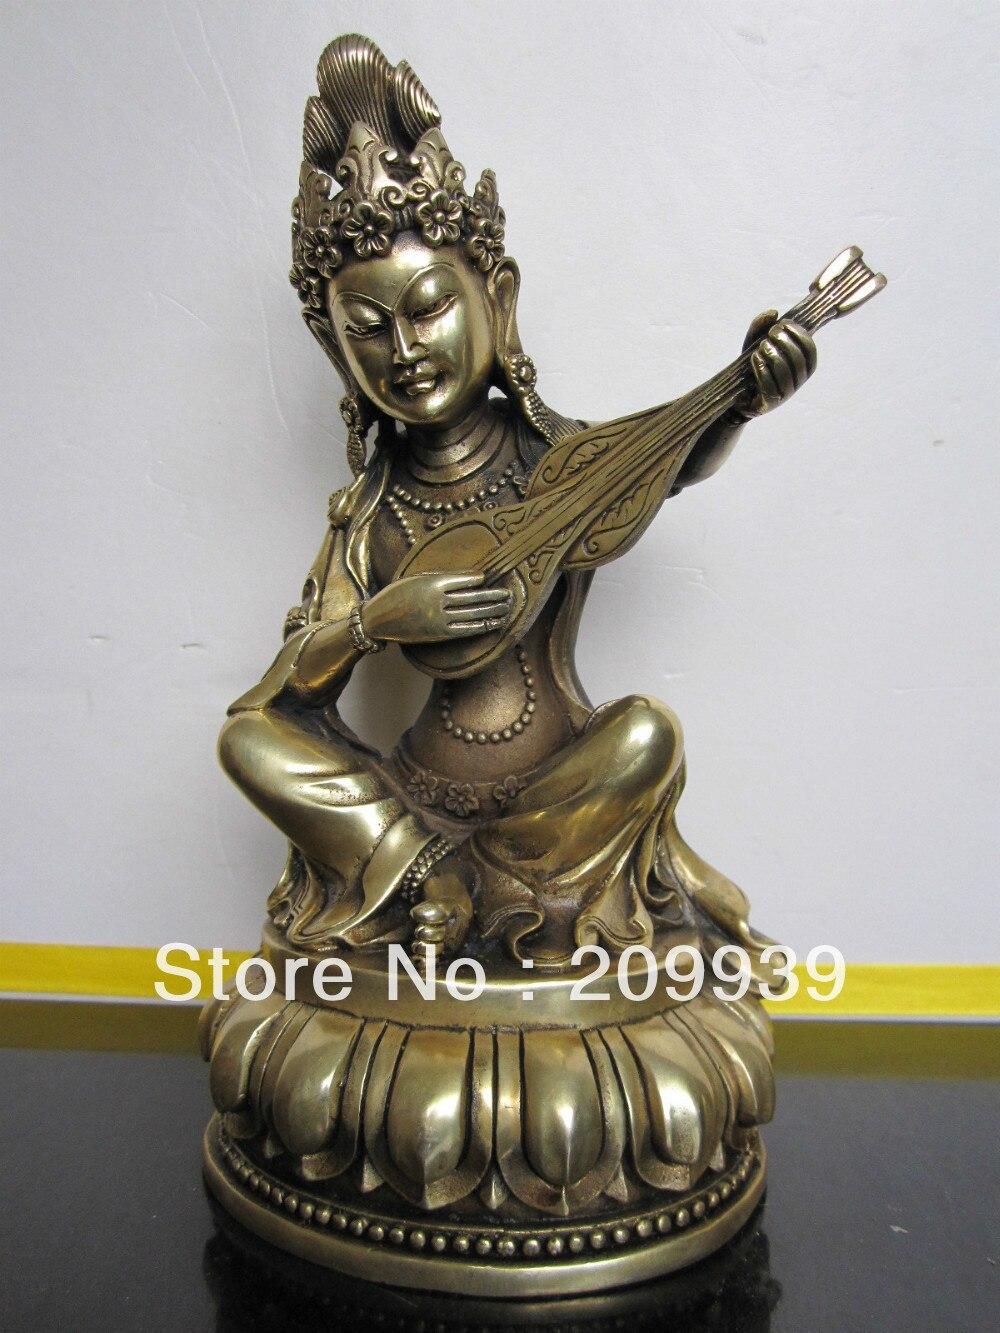 00933 Tibetan bronze Saraswati buddha statue statue statues buddha statue bronze - title=